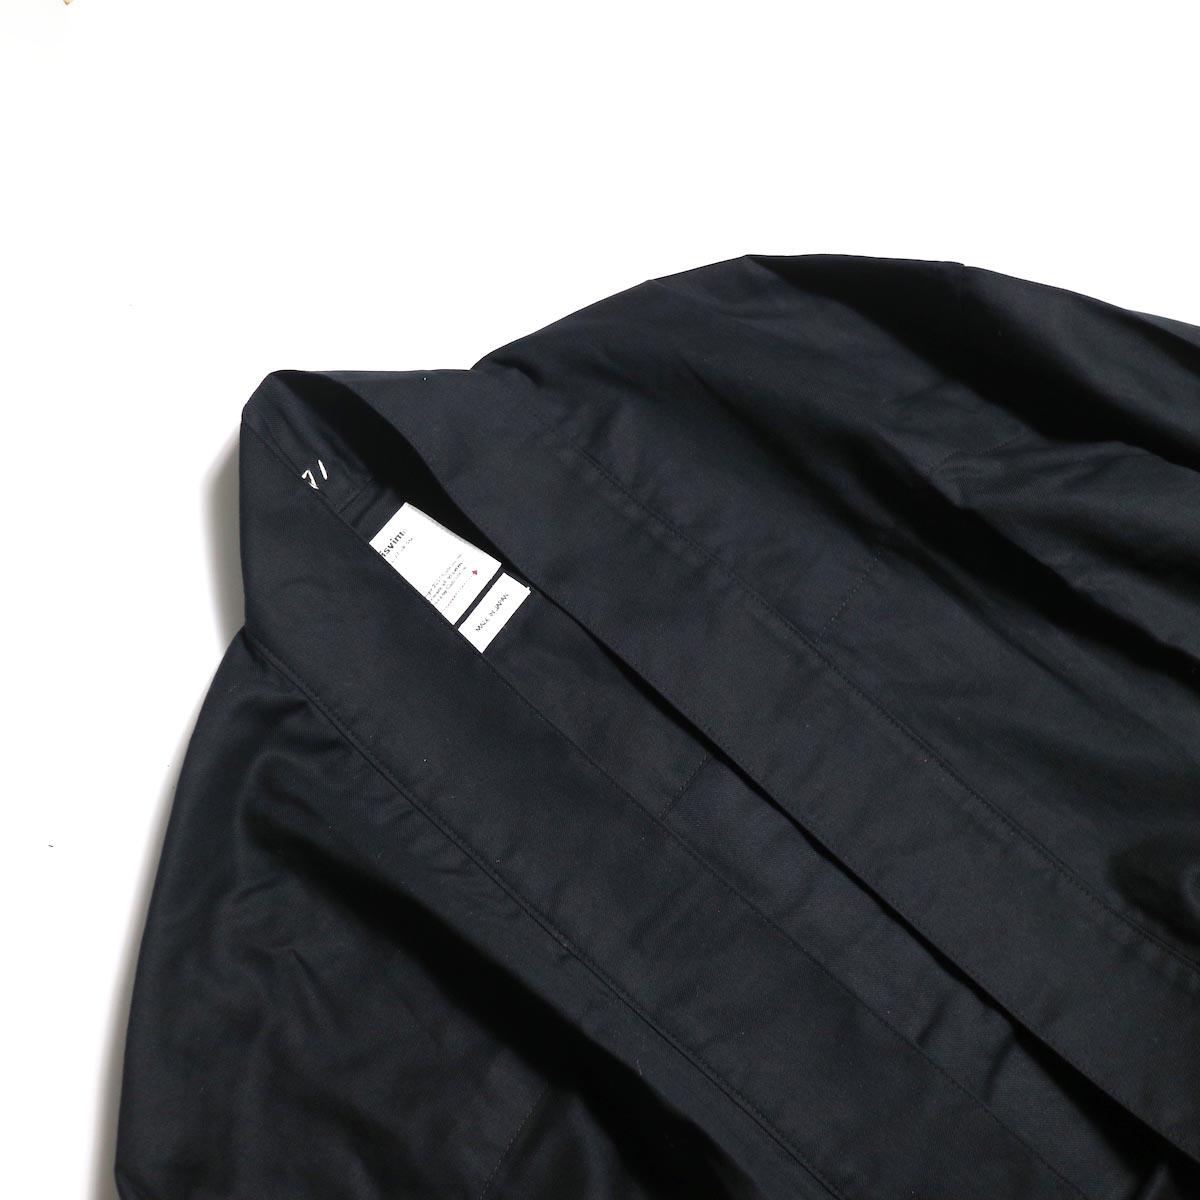 visvim / LHAMO SHIRT (BLACK)衿